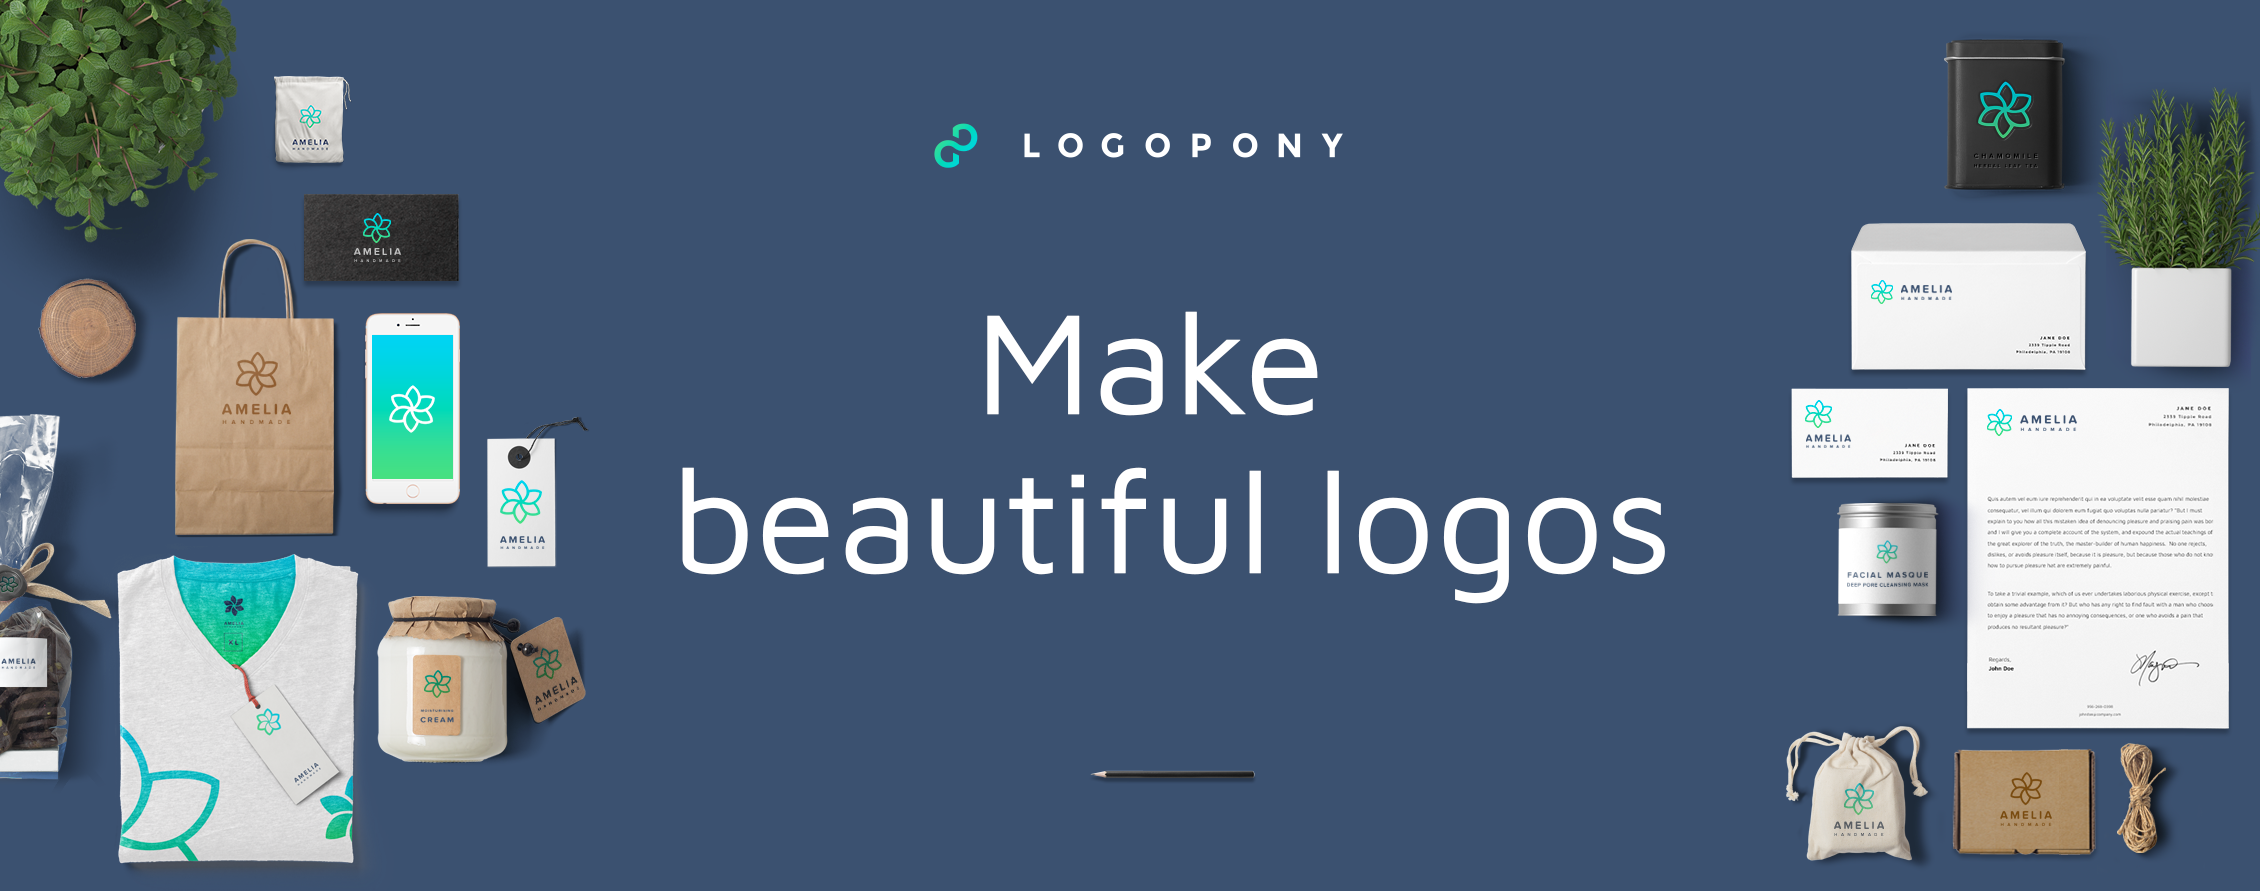 Logopony Logo Maker.